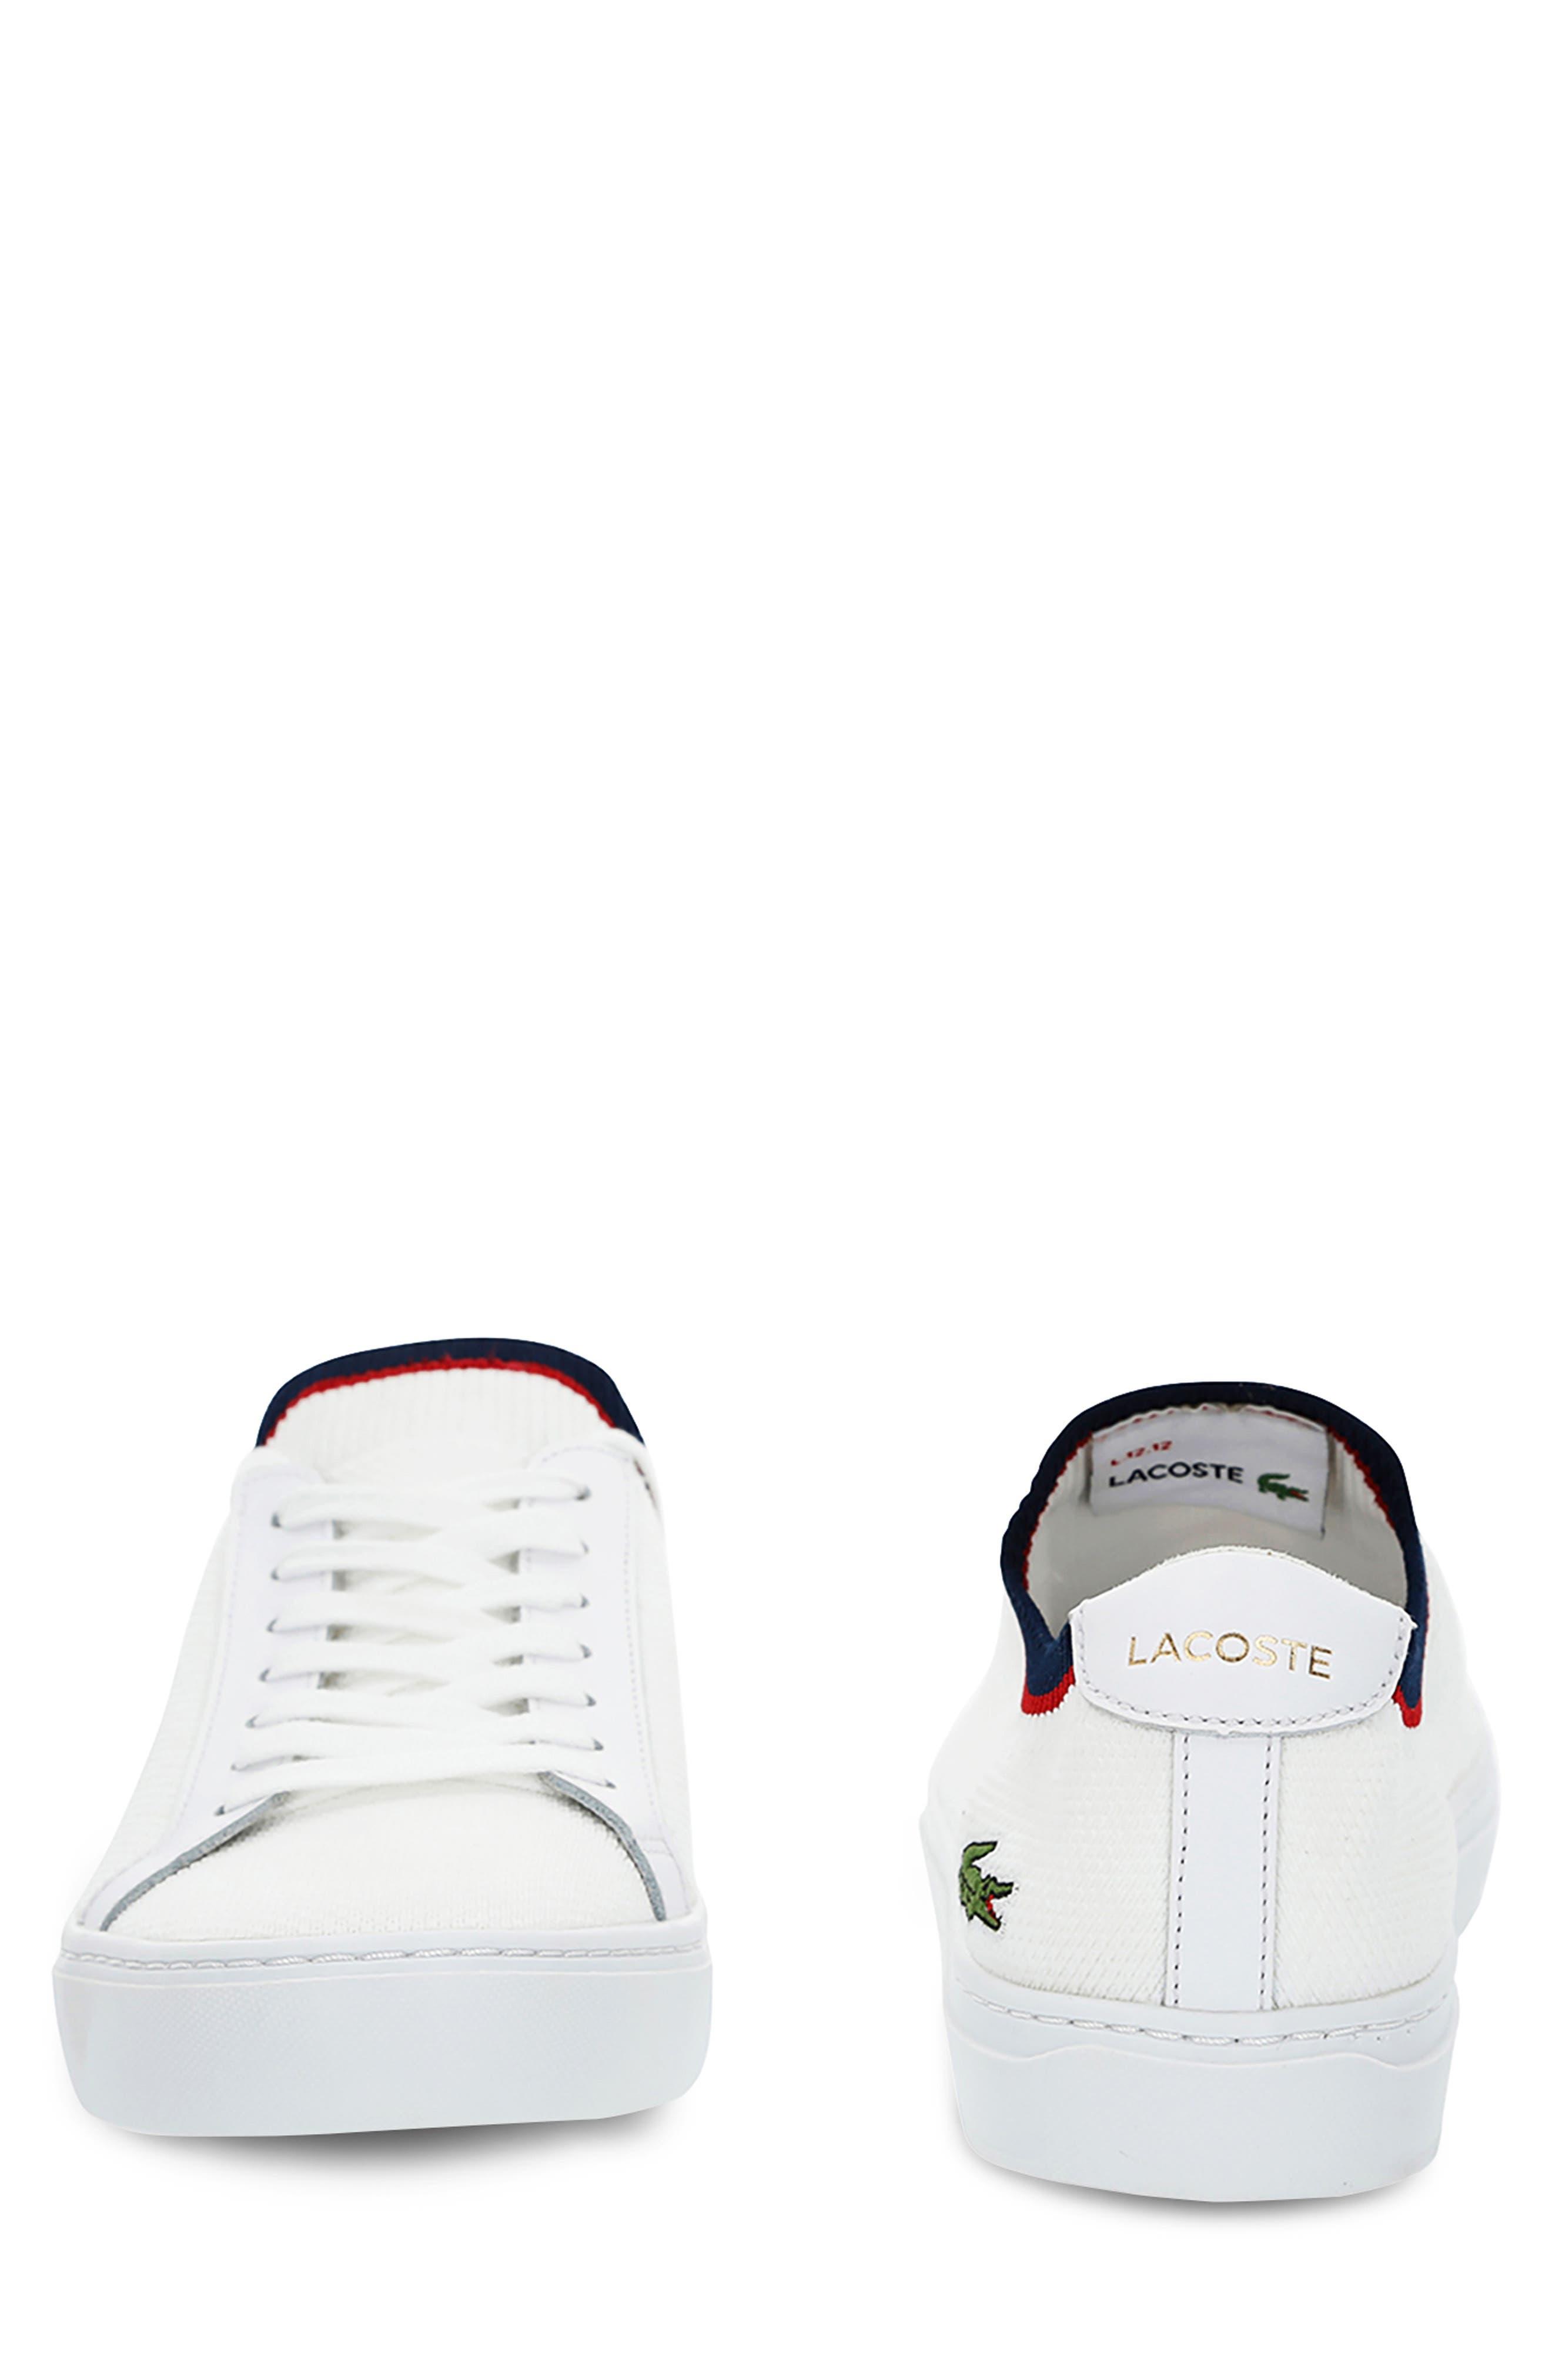 LACOSTE, Piqué Knit Sneaker, Alternate thumbnail 8, color, WHITE/ NAVY/ RED